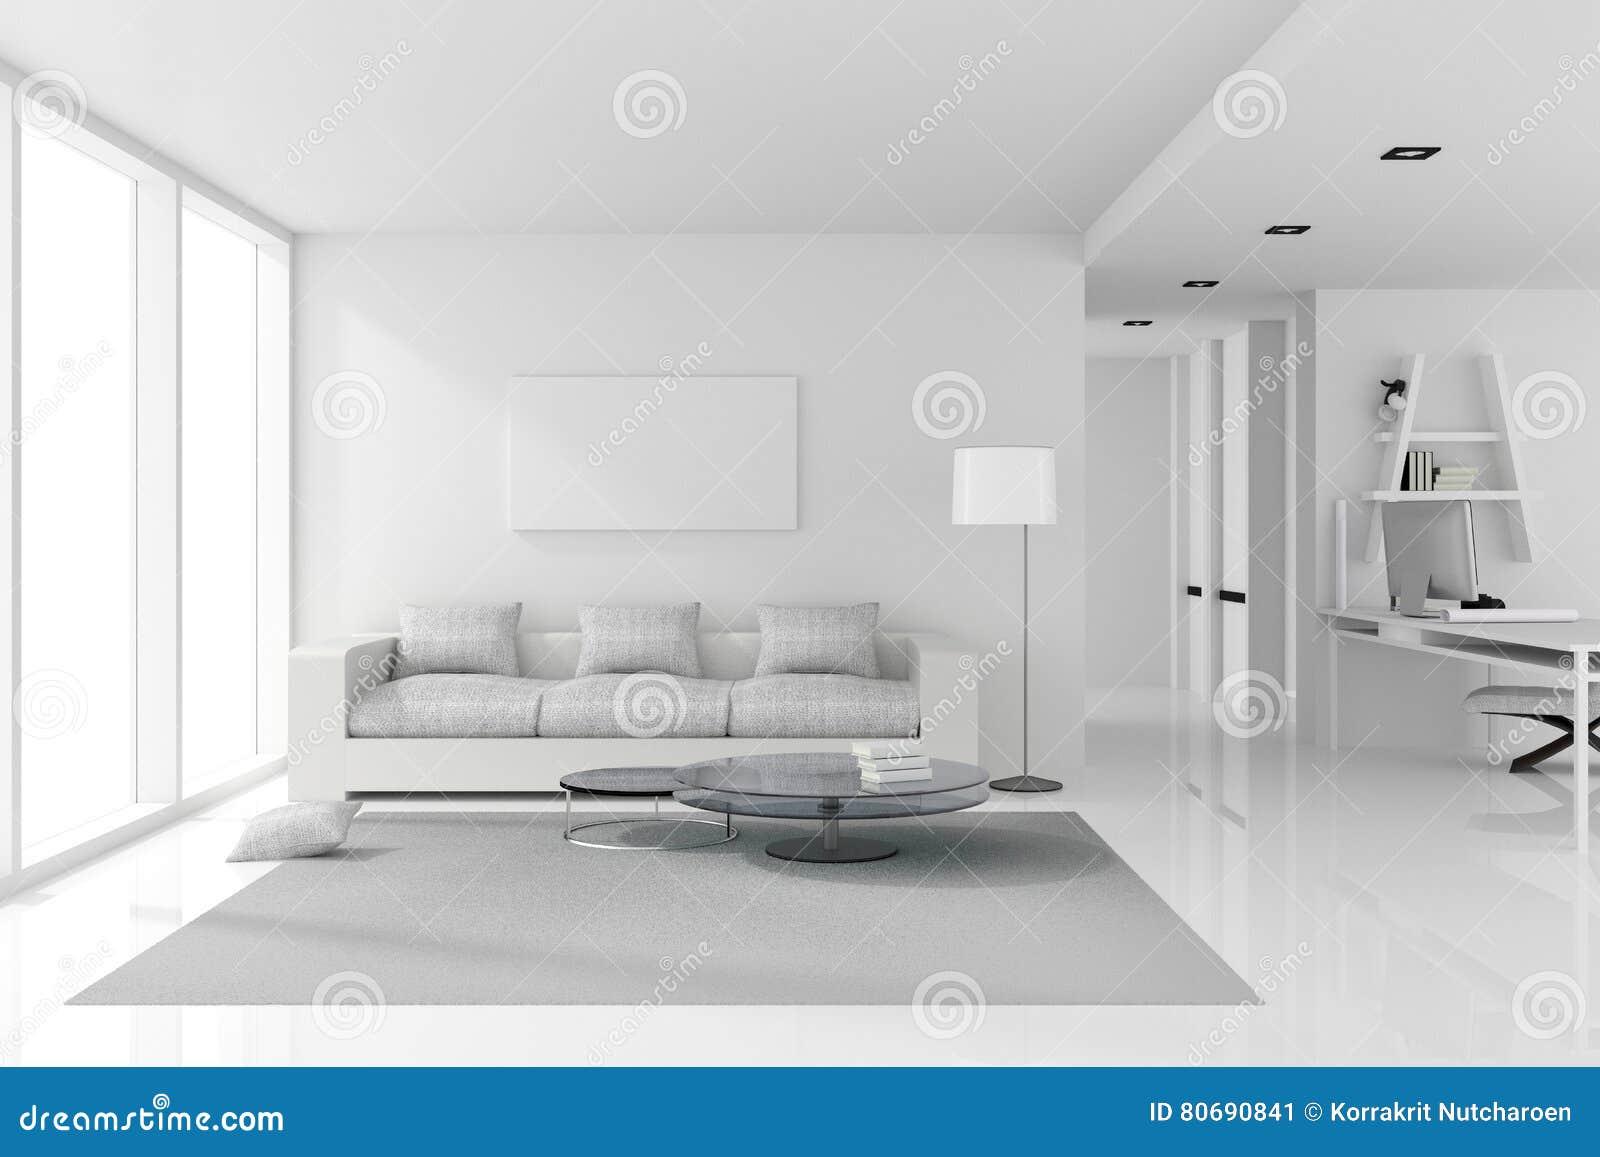 Rendi O 3d Ilustra O Do Design De Interiores Branco Da